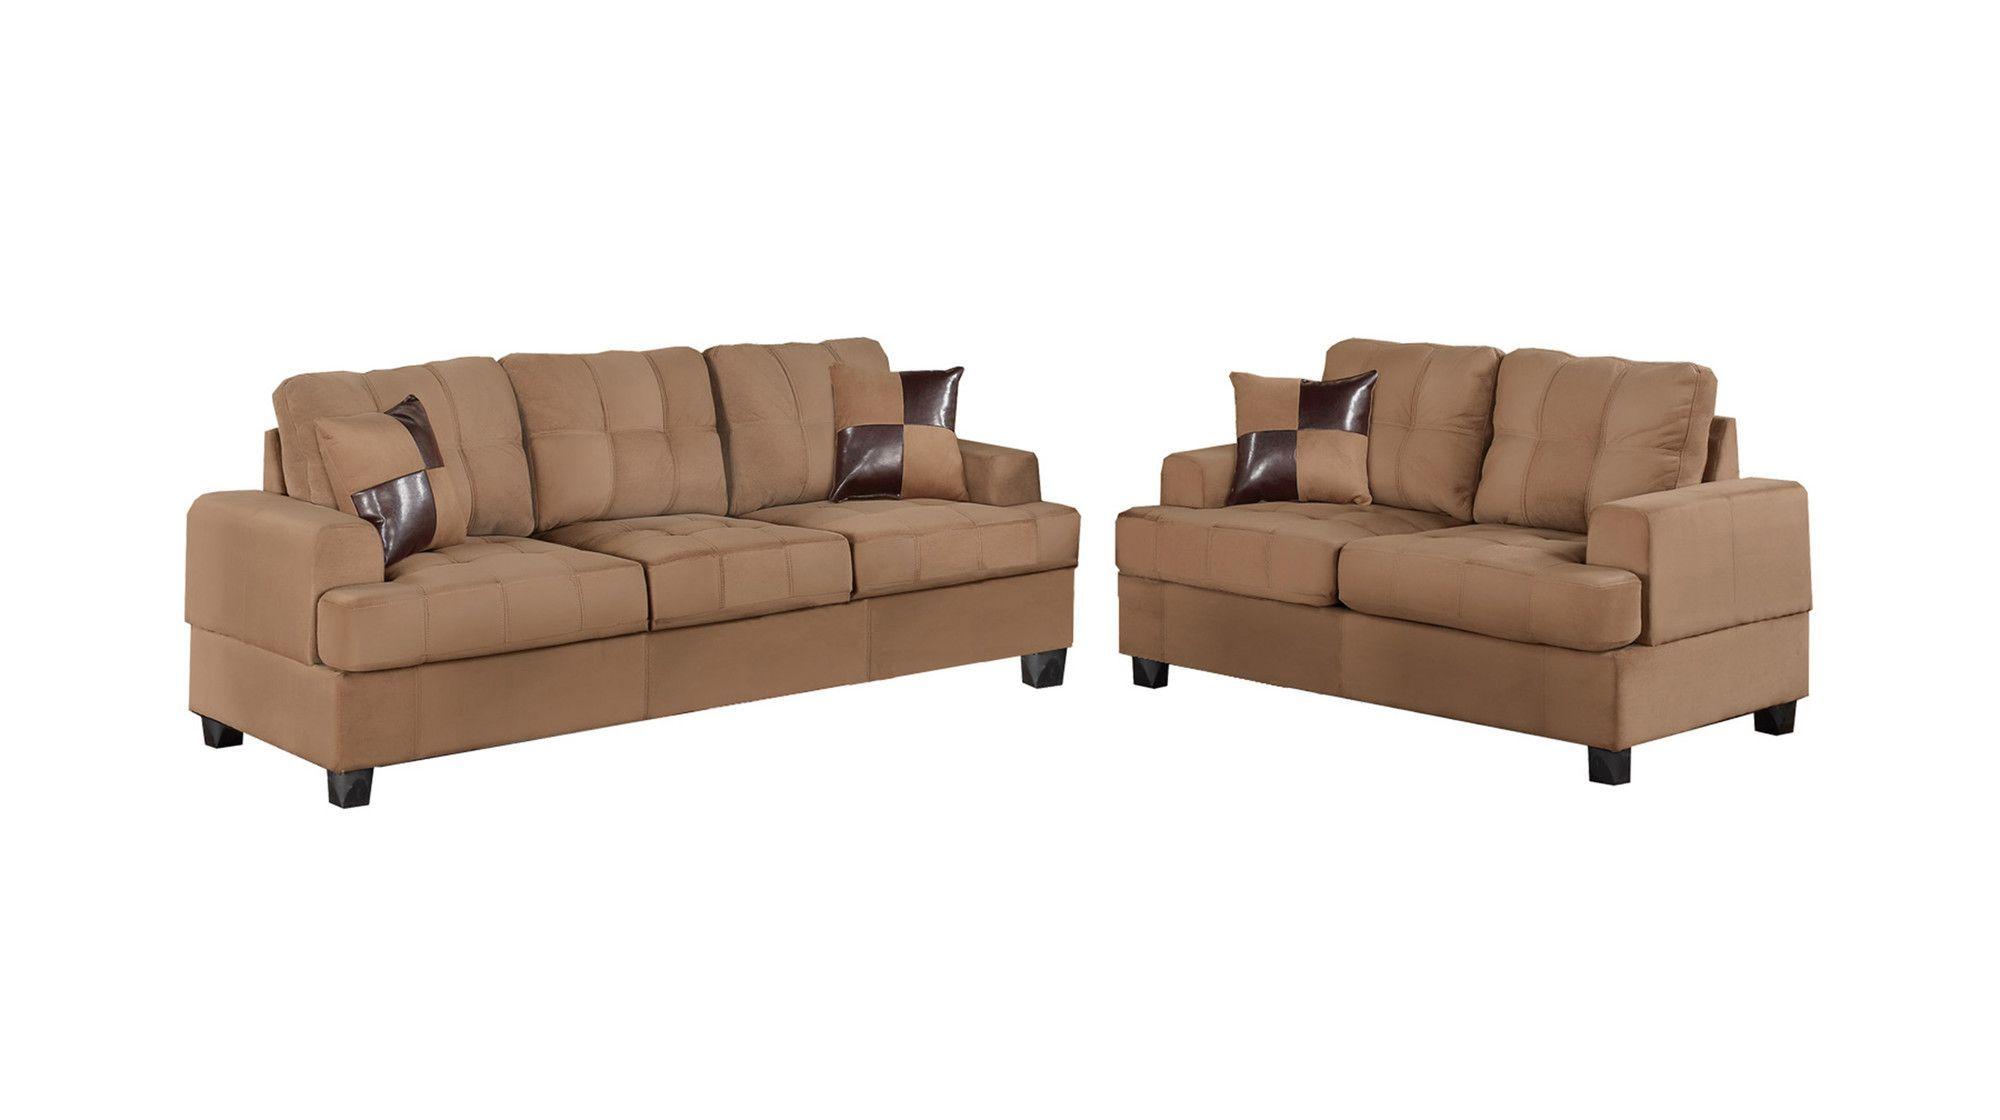 Birchview Sofa and Loveseat Set